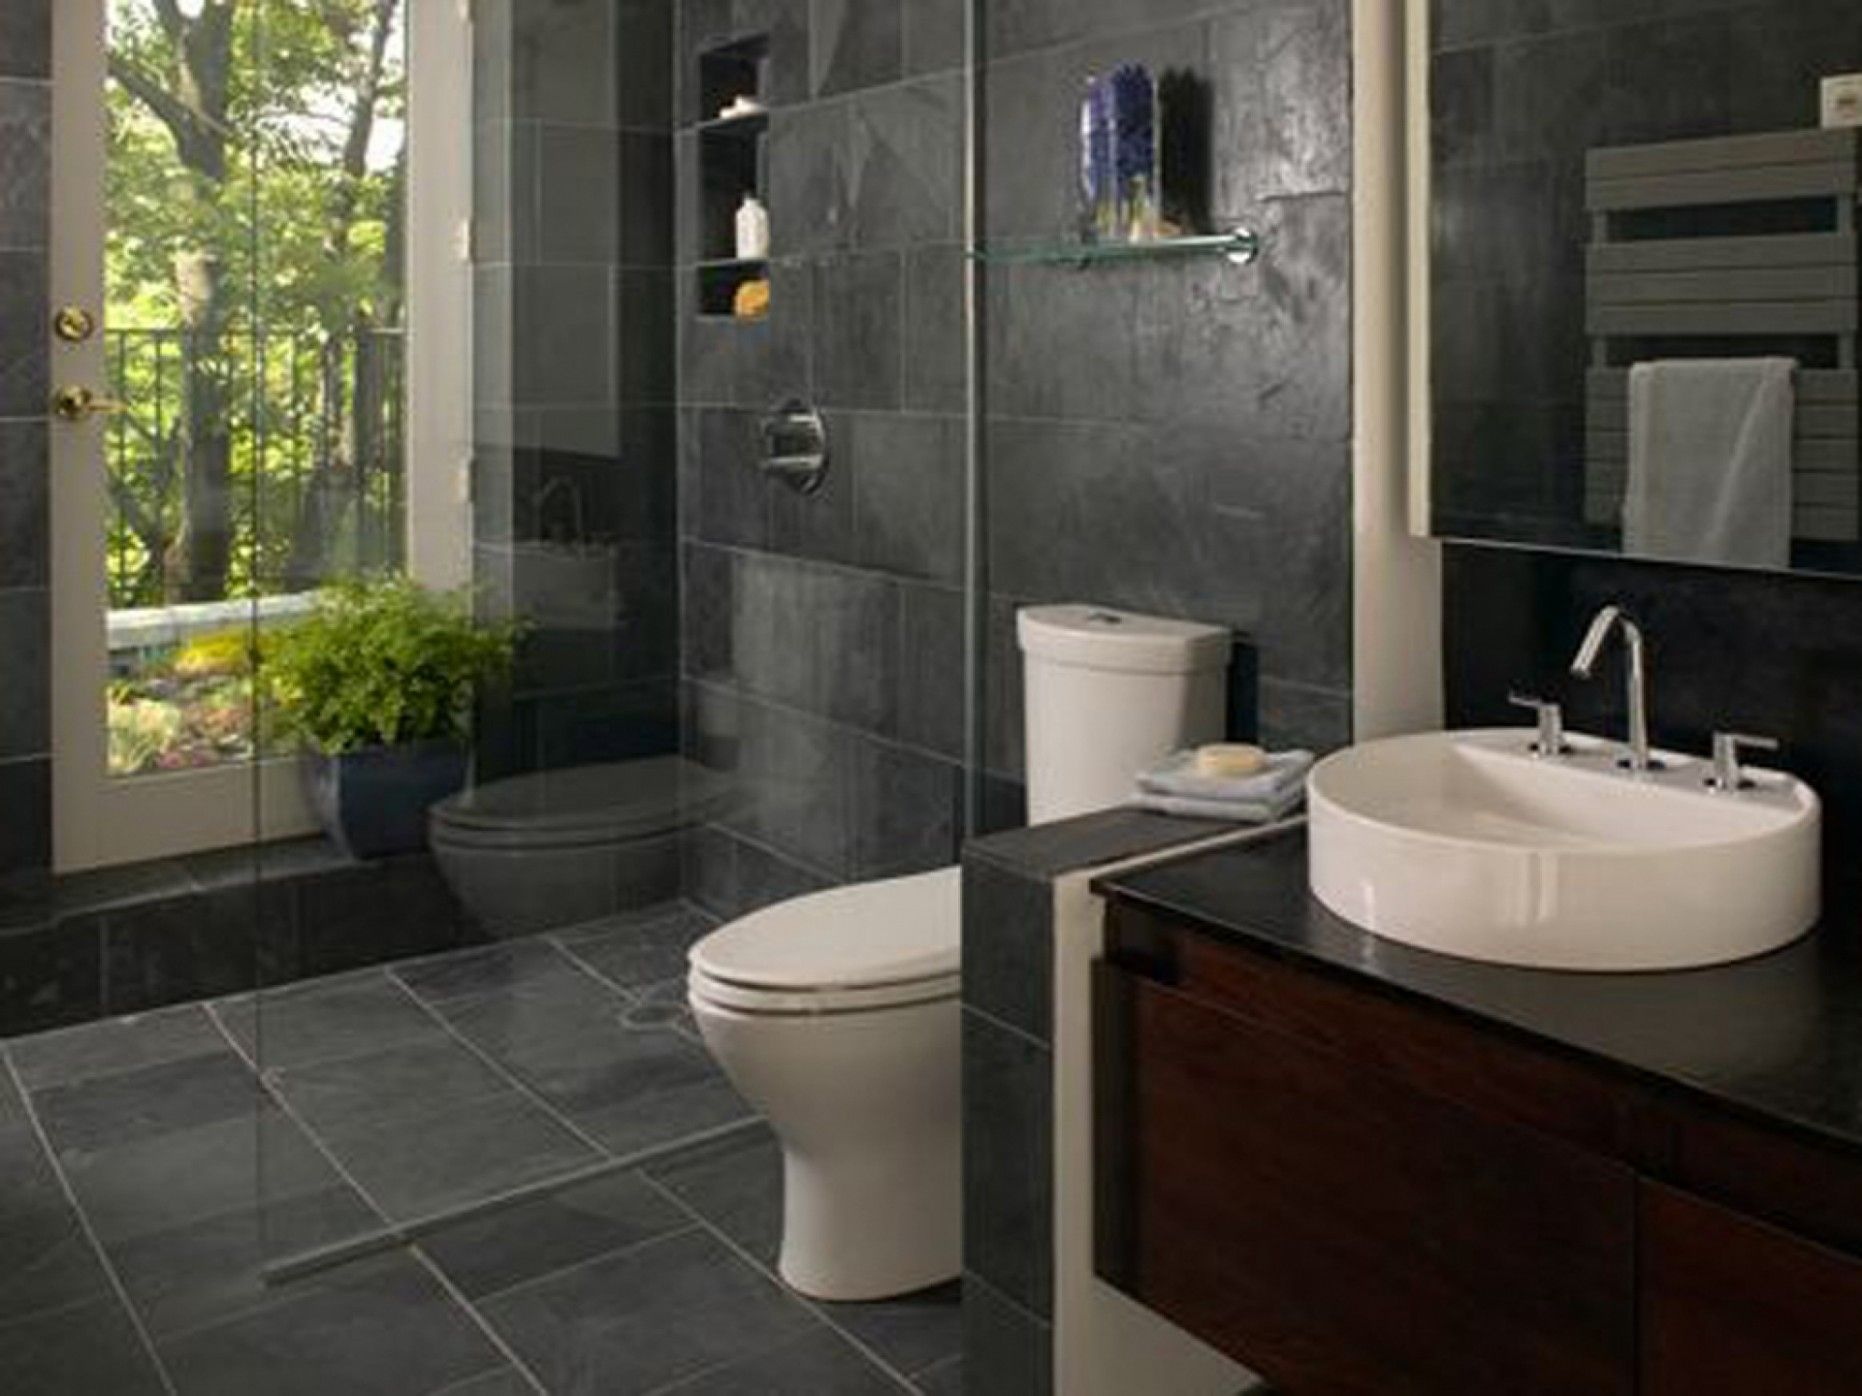 Small Bathroom Design Uk Dekorasi Kamar Mandi Kecil Desain Kamar Mandi Modern Desain Kamar Mandi Kecil Bathroom decor ideas uk